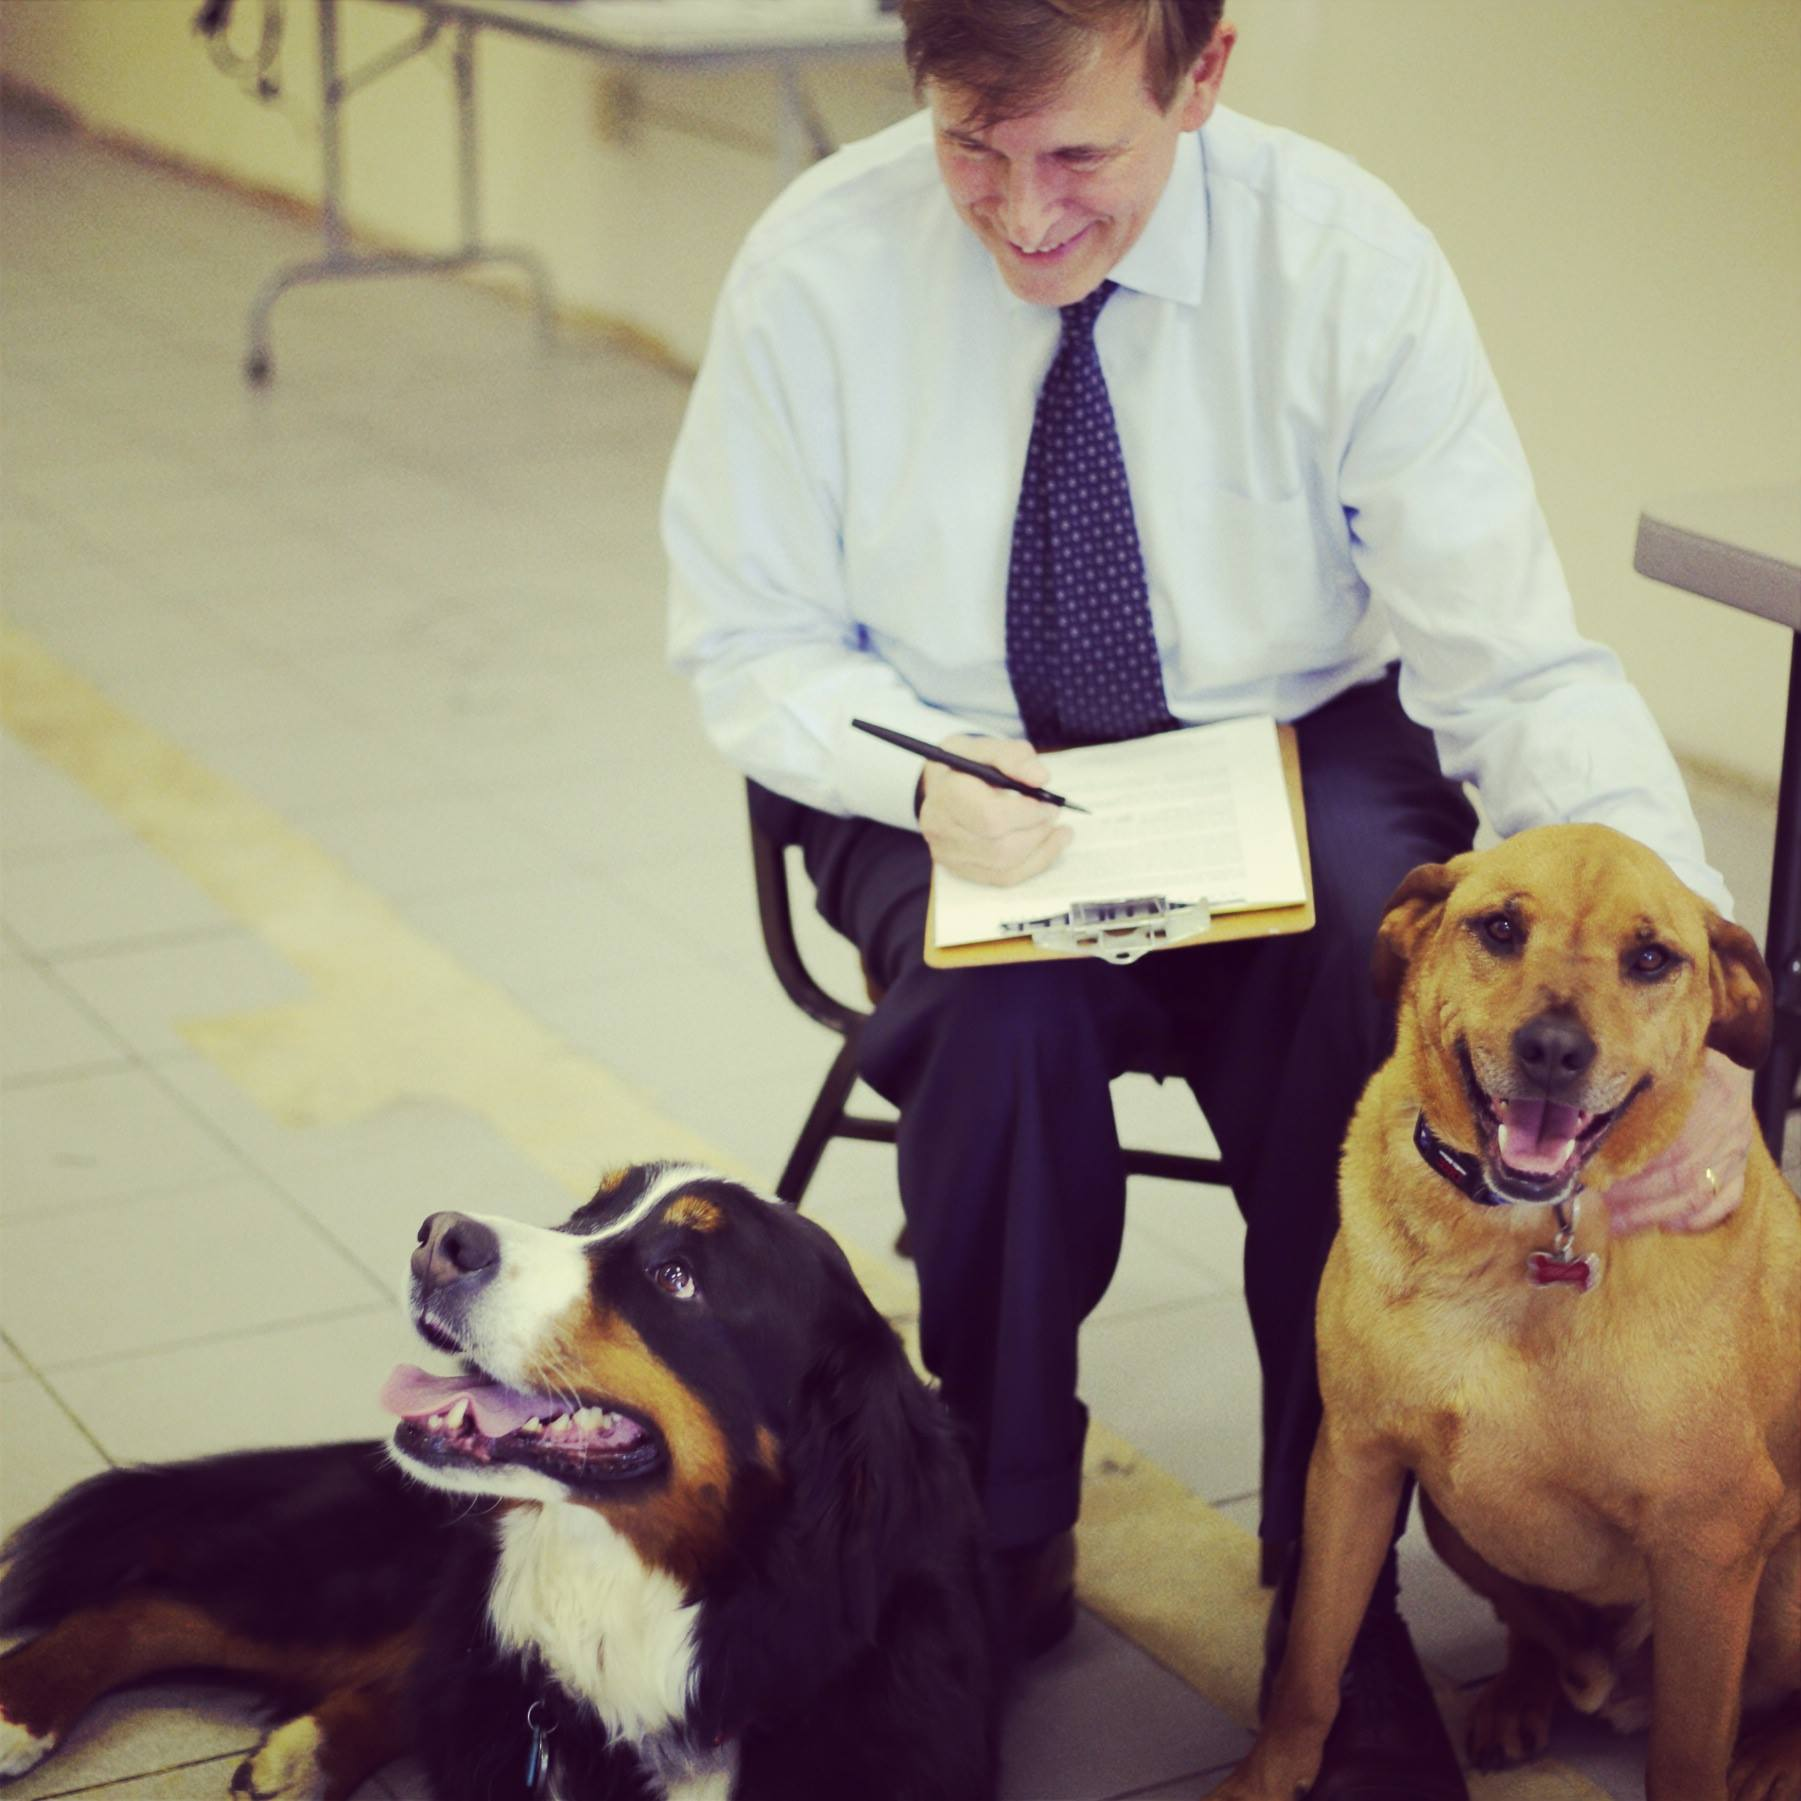 Puppy Endorsed Candidate